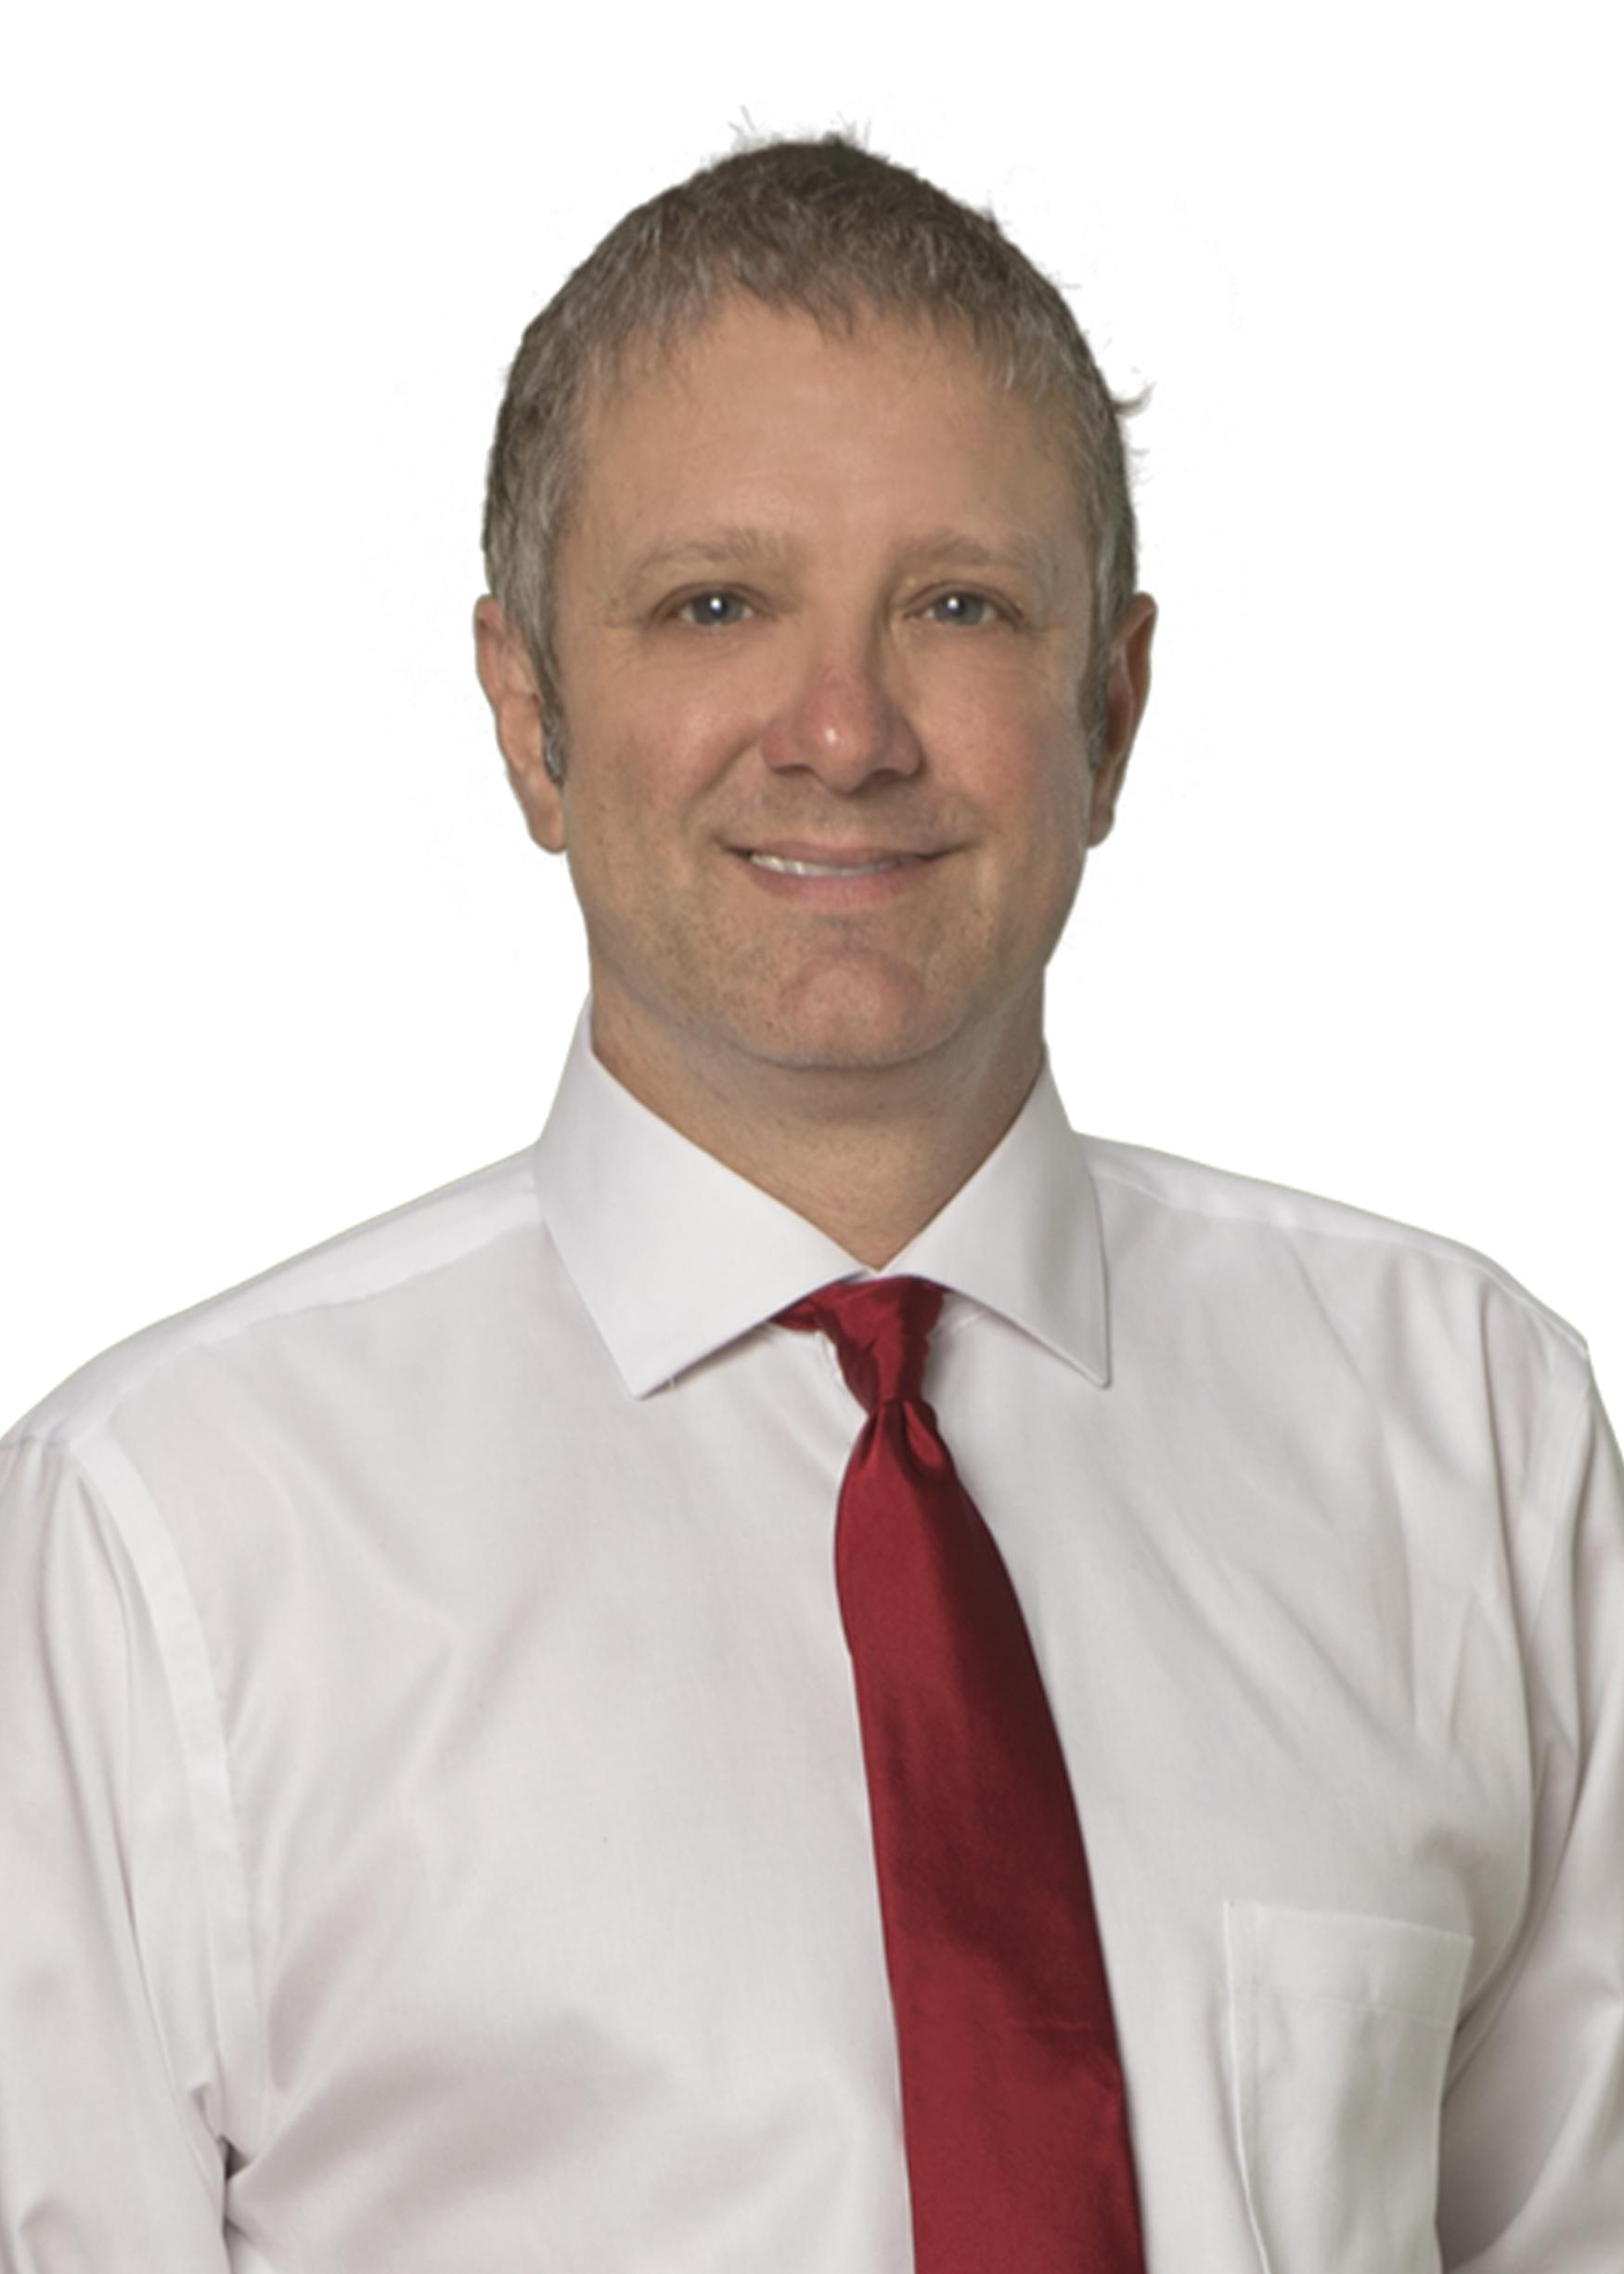 Patrick Dutmers